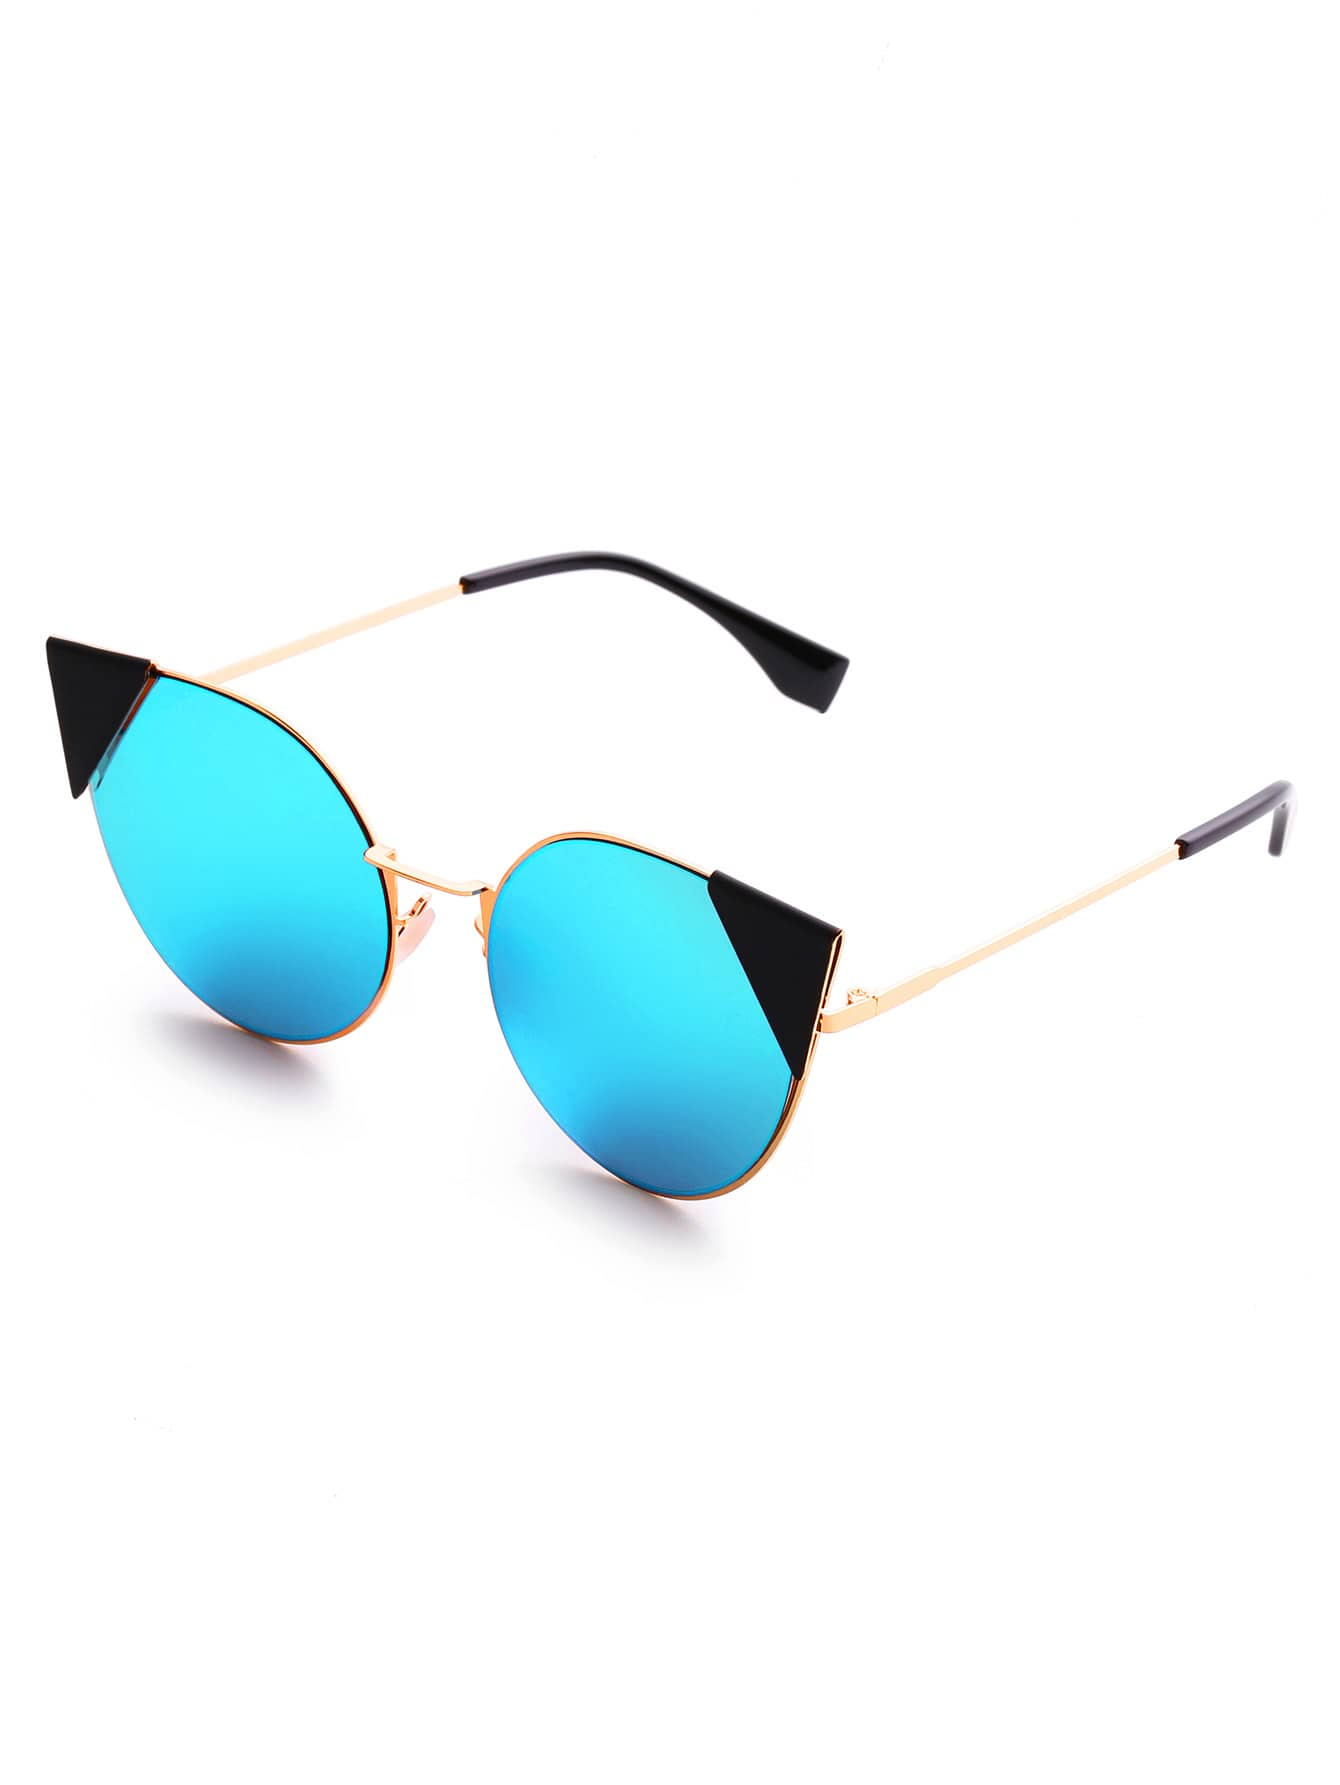 Flash Lens Cat Eye Sunglasses sunglass170706307